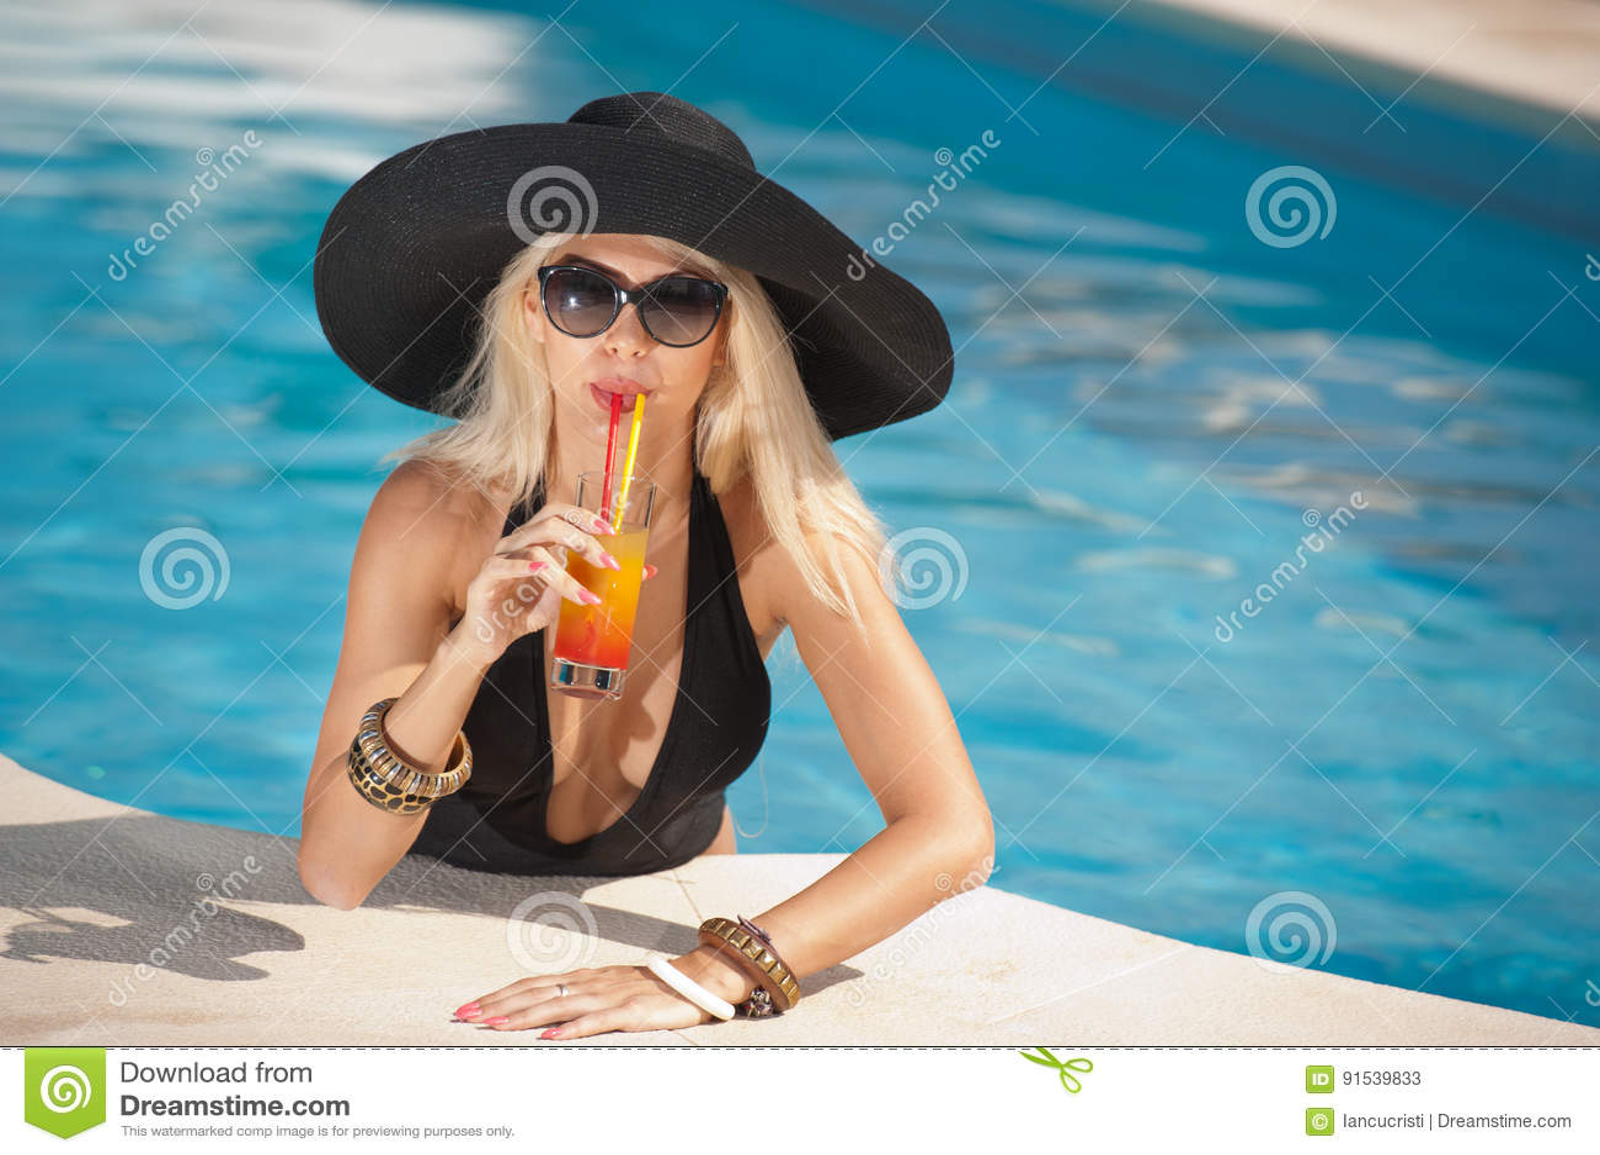 c8d921828e3 Όμορφος αισθησιακός ξανθός με τα μοντέρνα γυαλιά ηλίου που ...